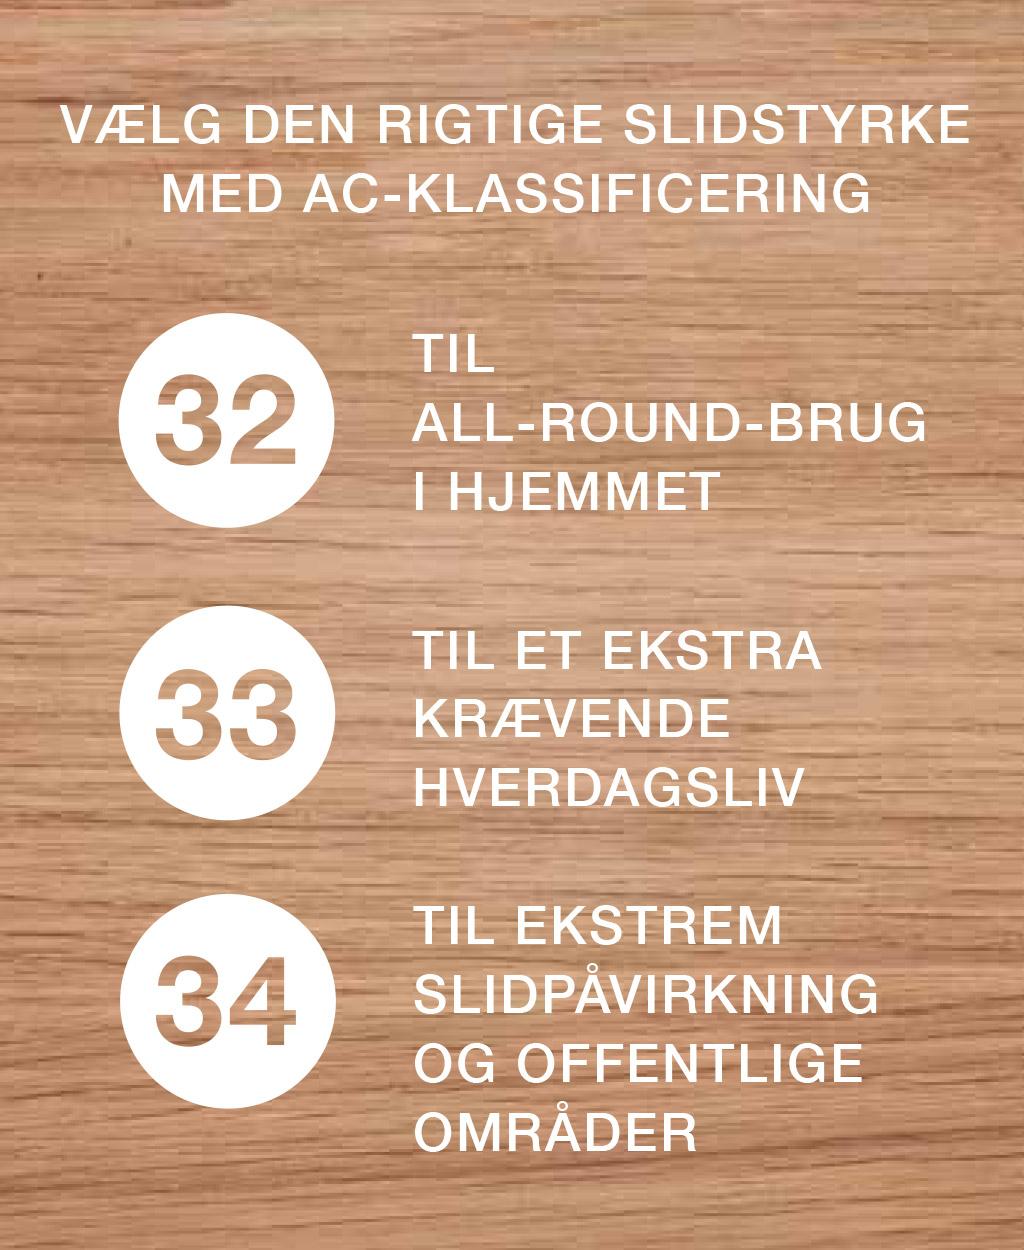 pergo-infographic-et-robust-laminatgulv-i-eg-ac-klassificering